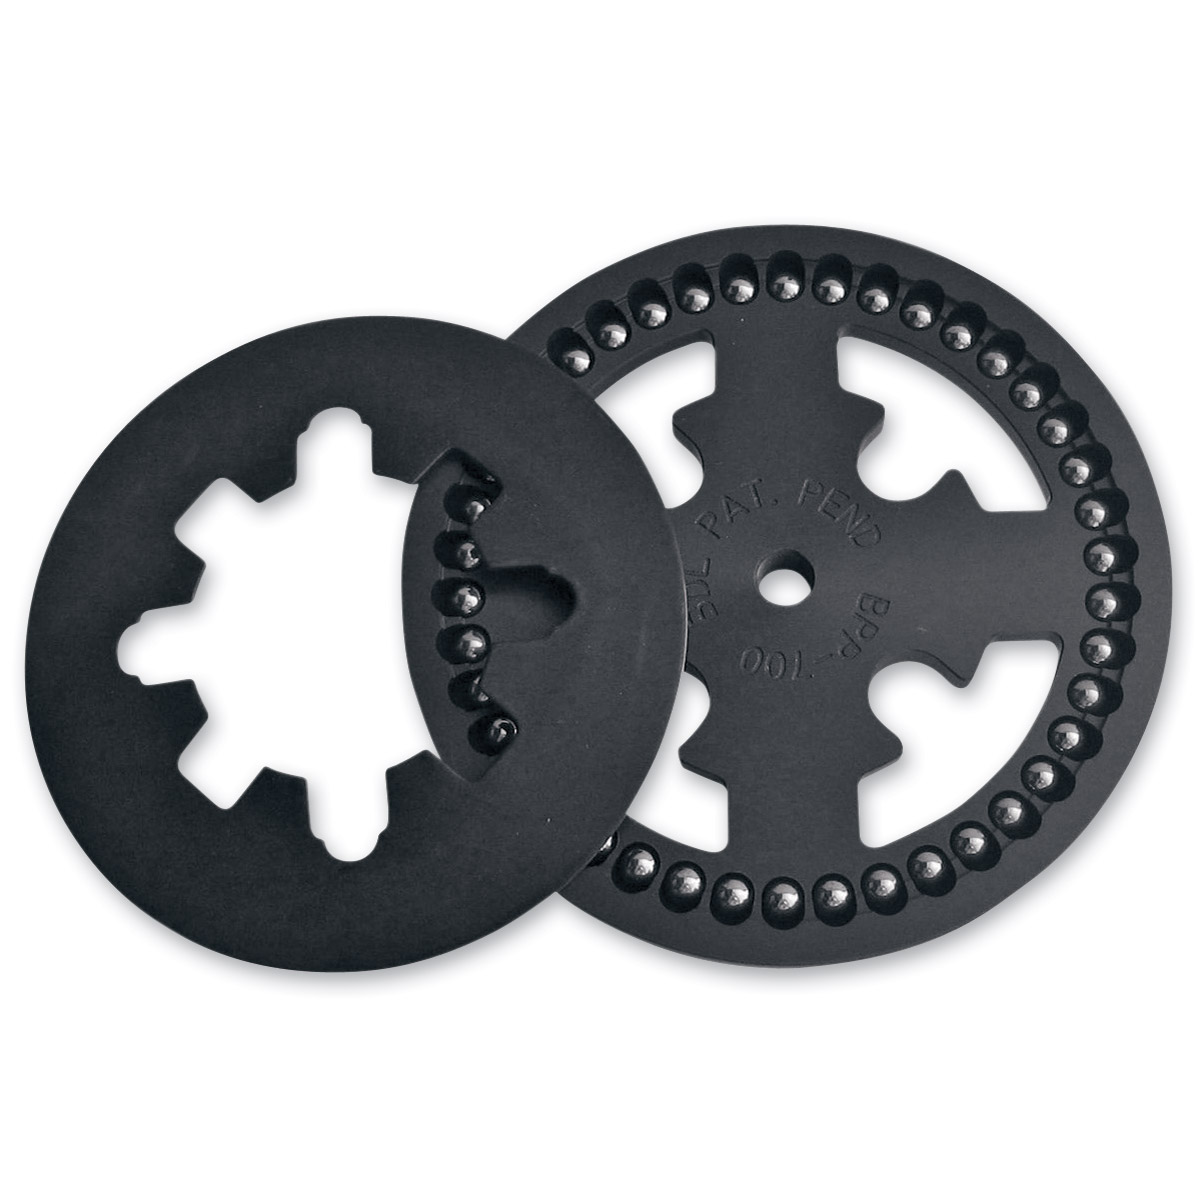 BDL Ball-Bearing Lockup Clutch Conversion Kit